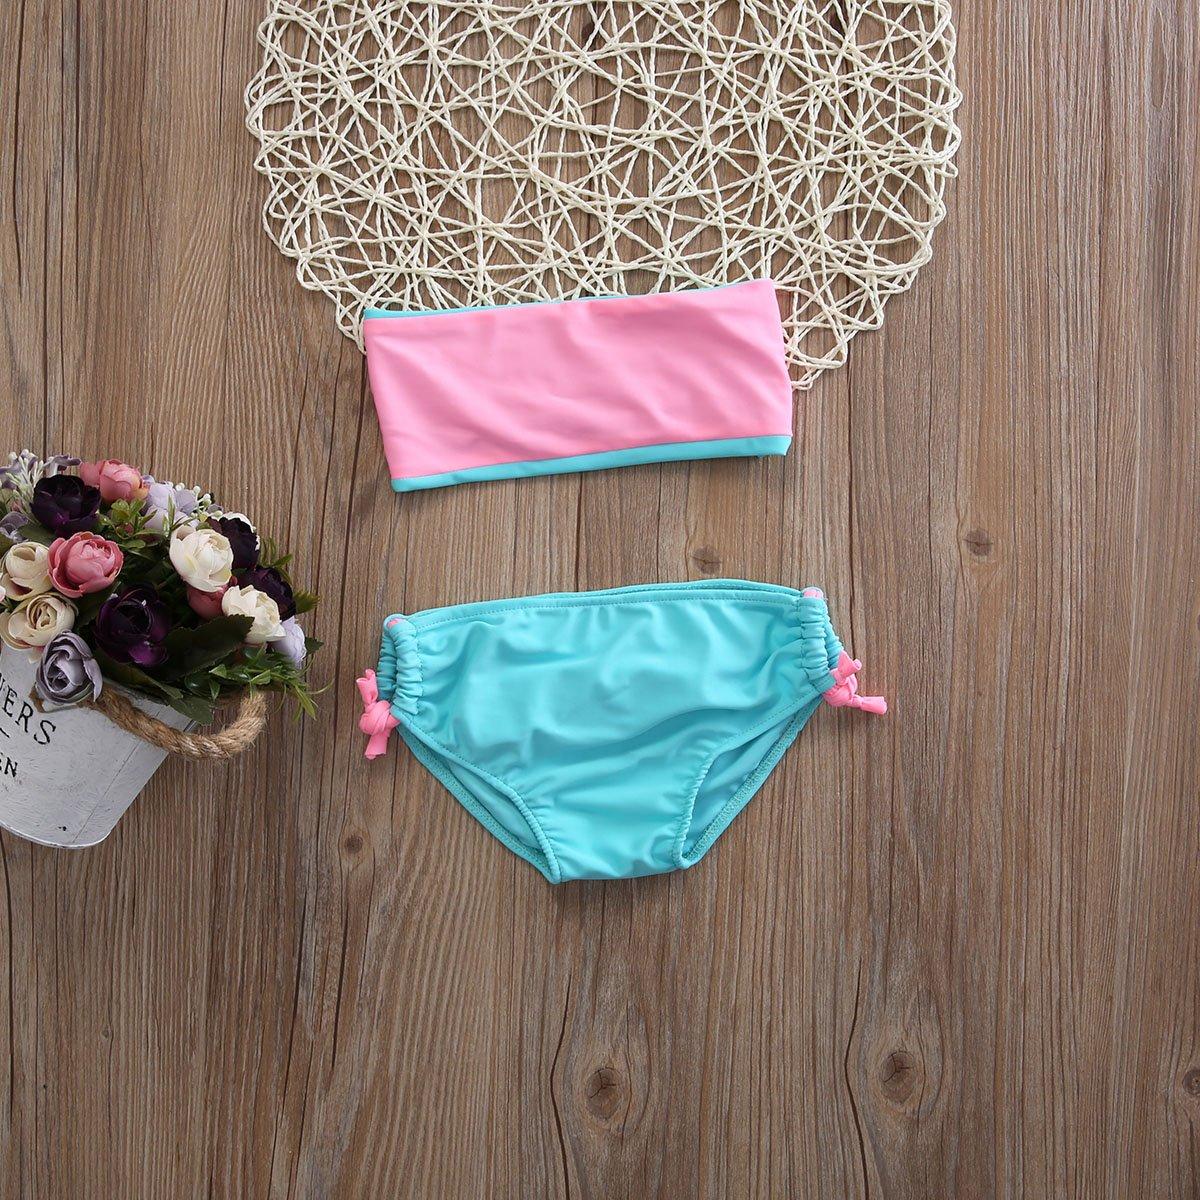 Pudcoco Kids Little Girls 2 pcs Bikini Set Bra Tube Top and Bowknot Shorts Swimsuit